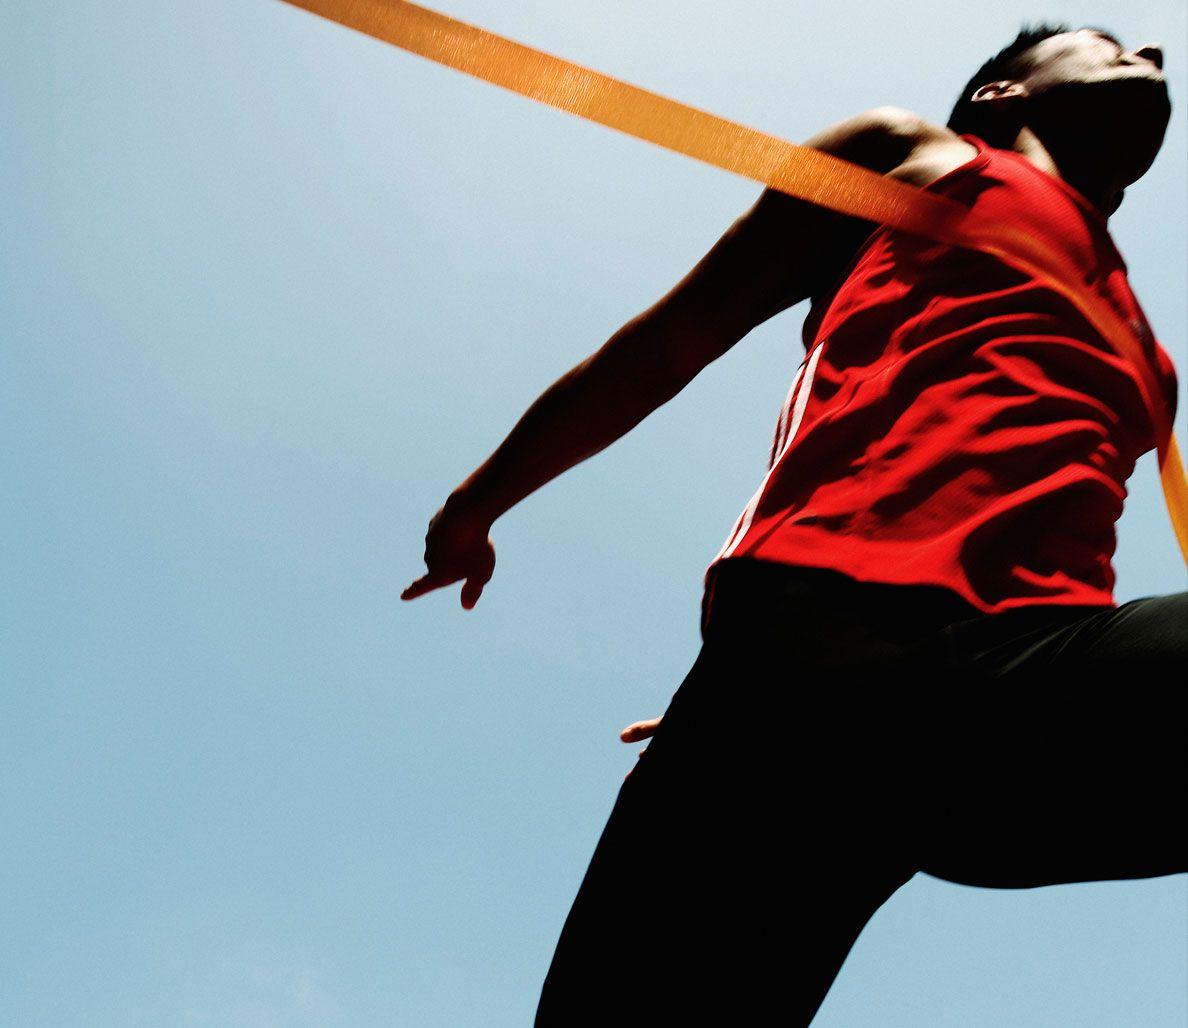 Three Pro Endurance Athletes' Worst Moments